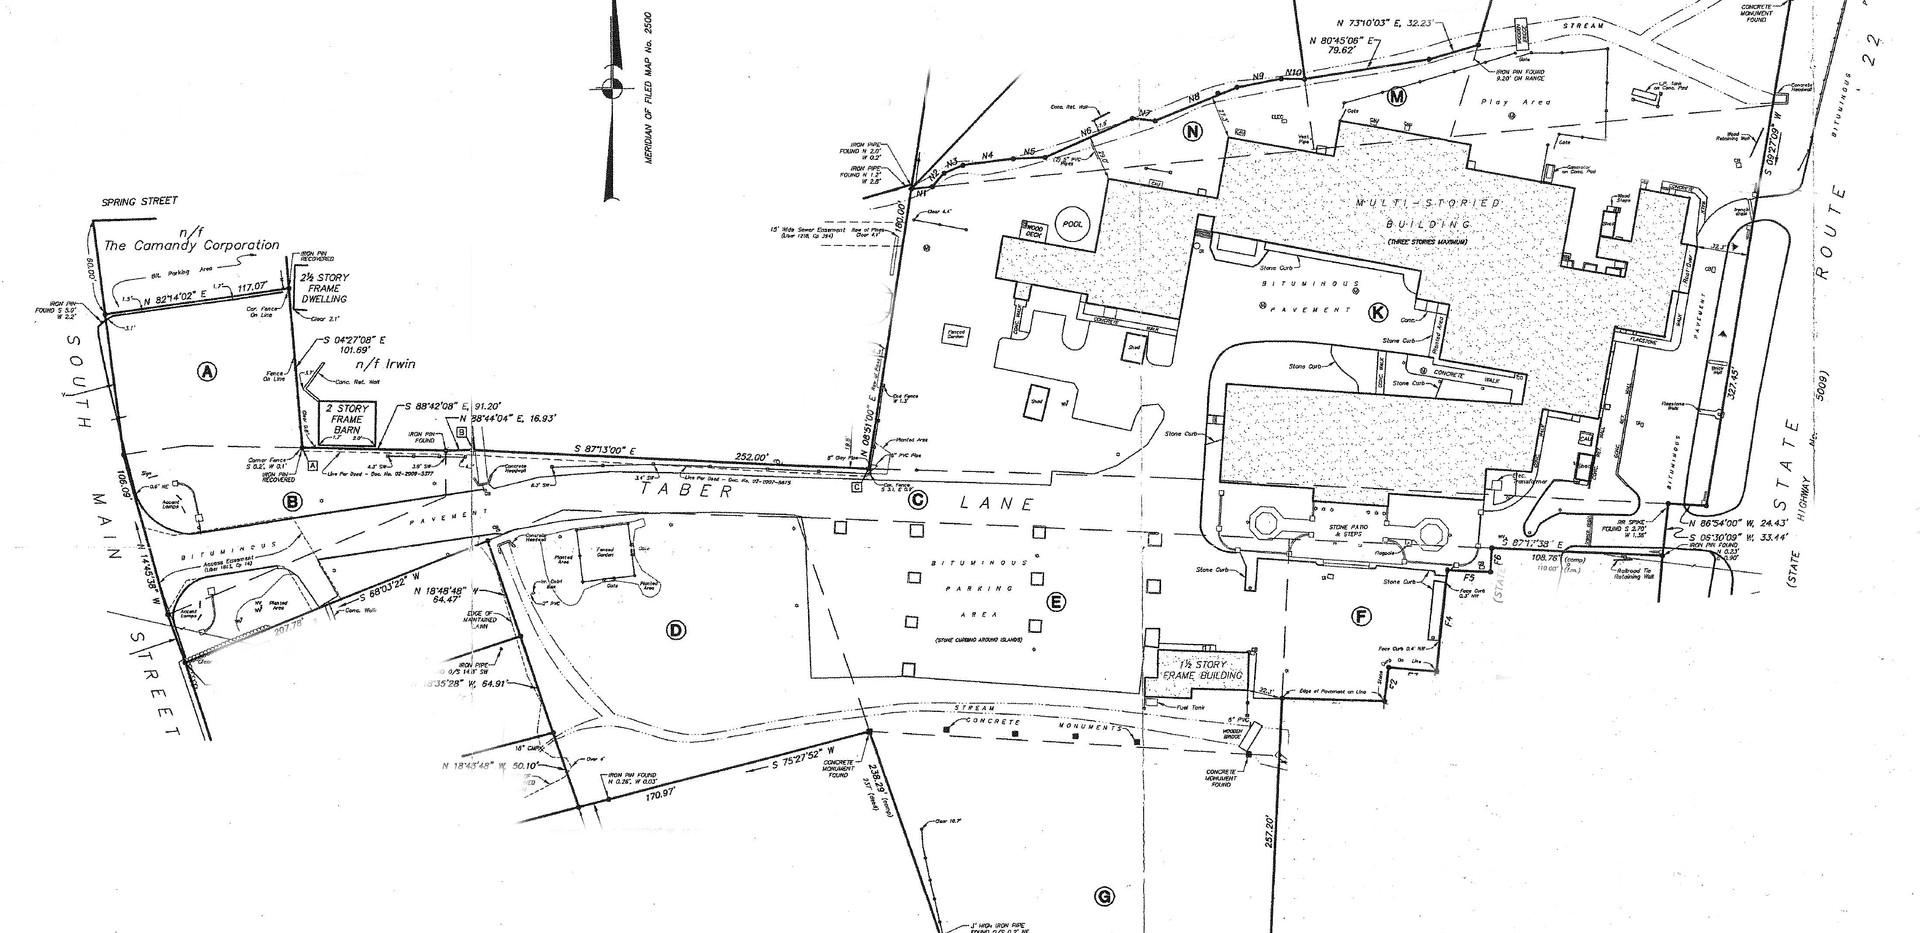 535 Route 22 - Site Plan